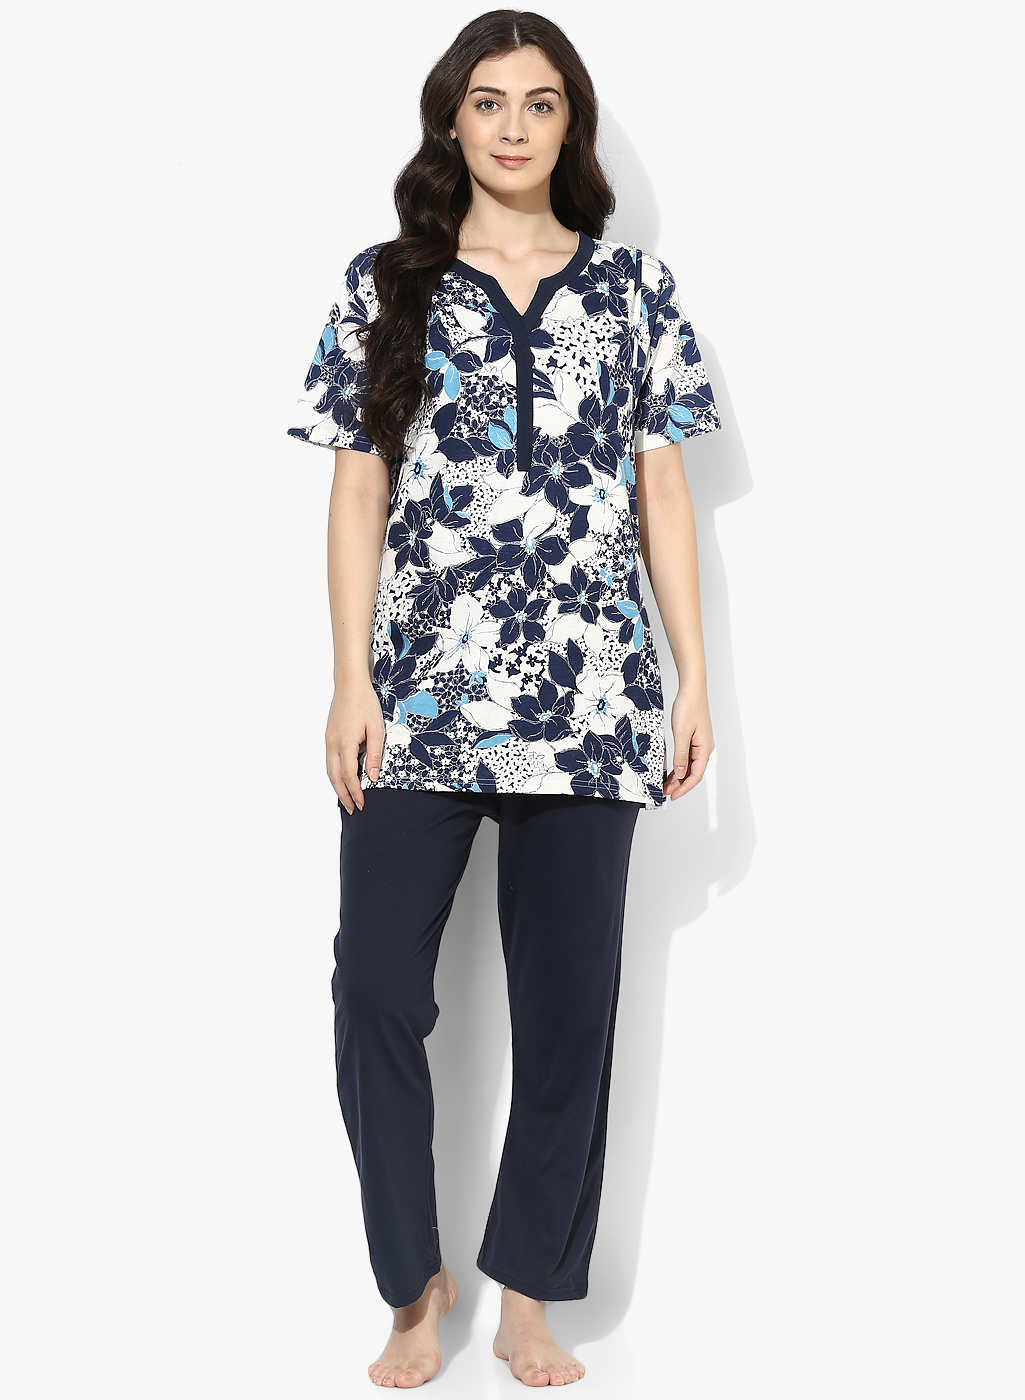 9teenAGAIN Women s Floral-Printed Cotton Nursing Night-Suit - All ... 4bcdabe34